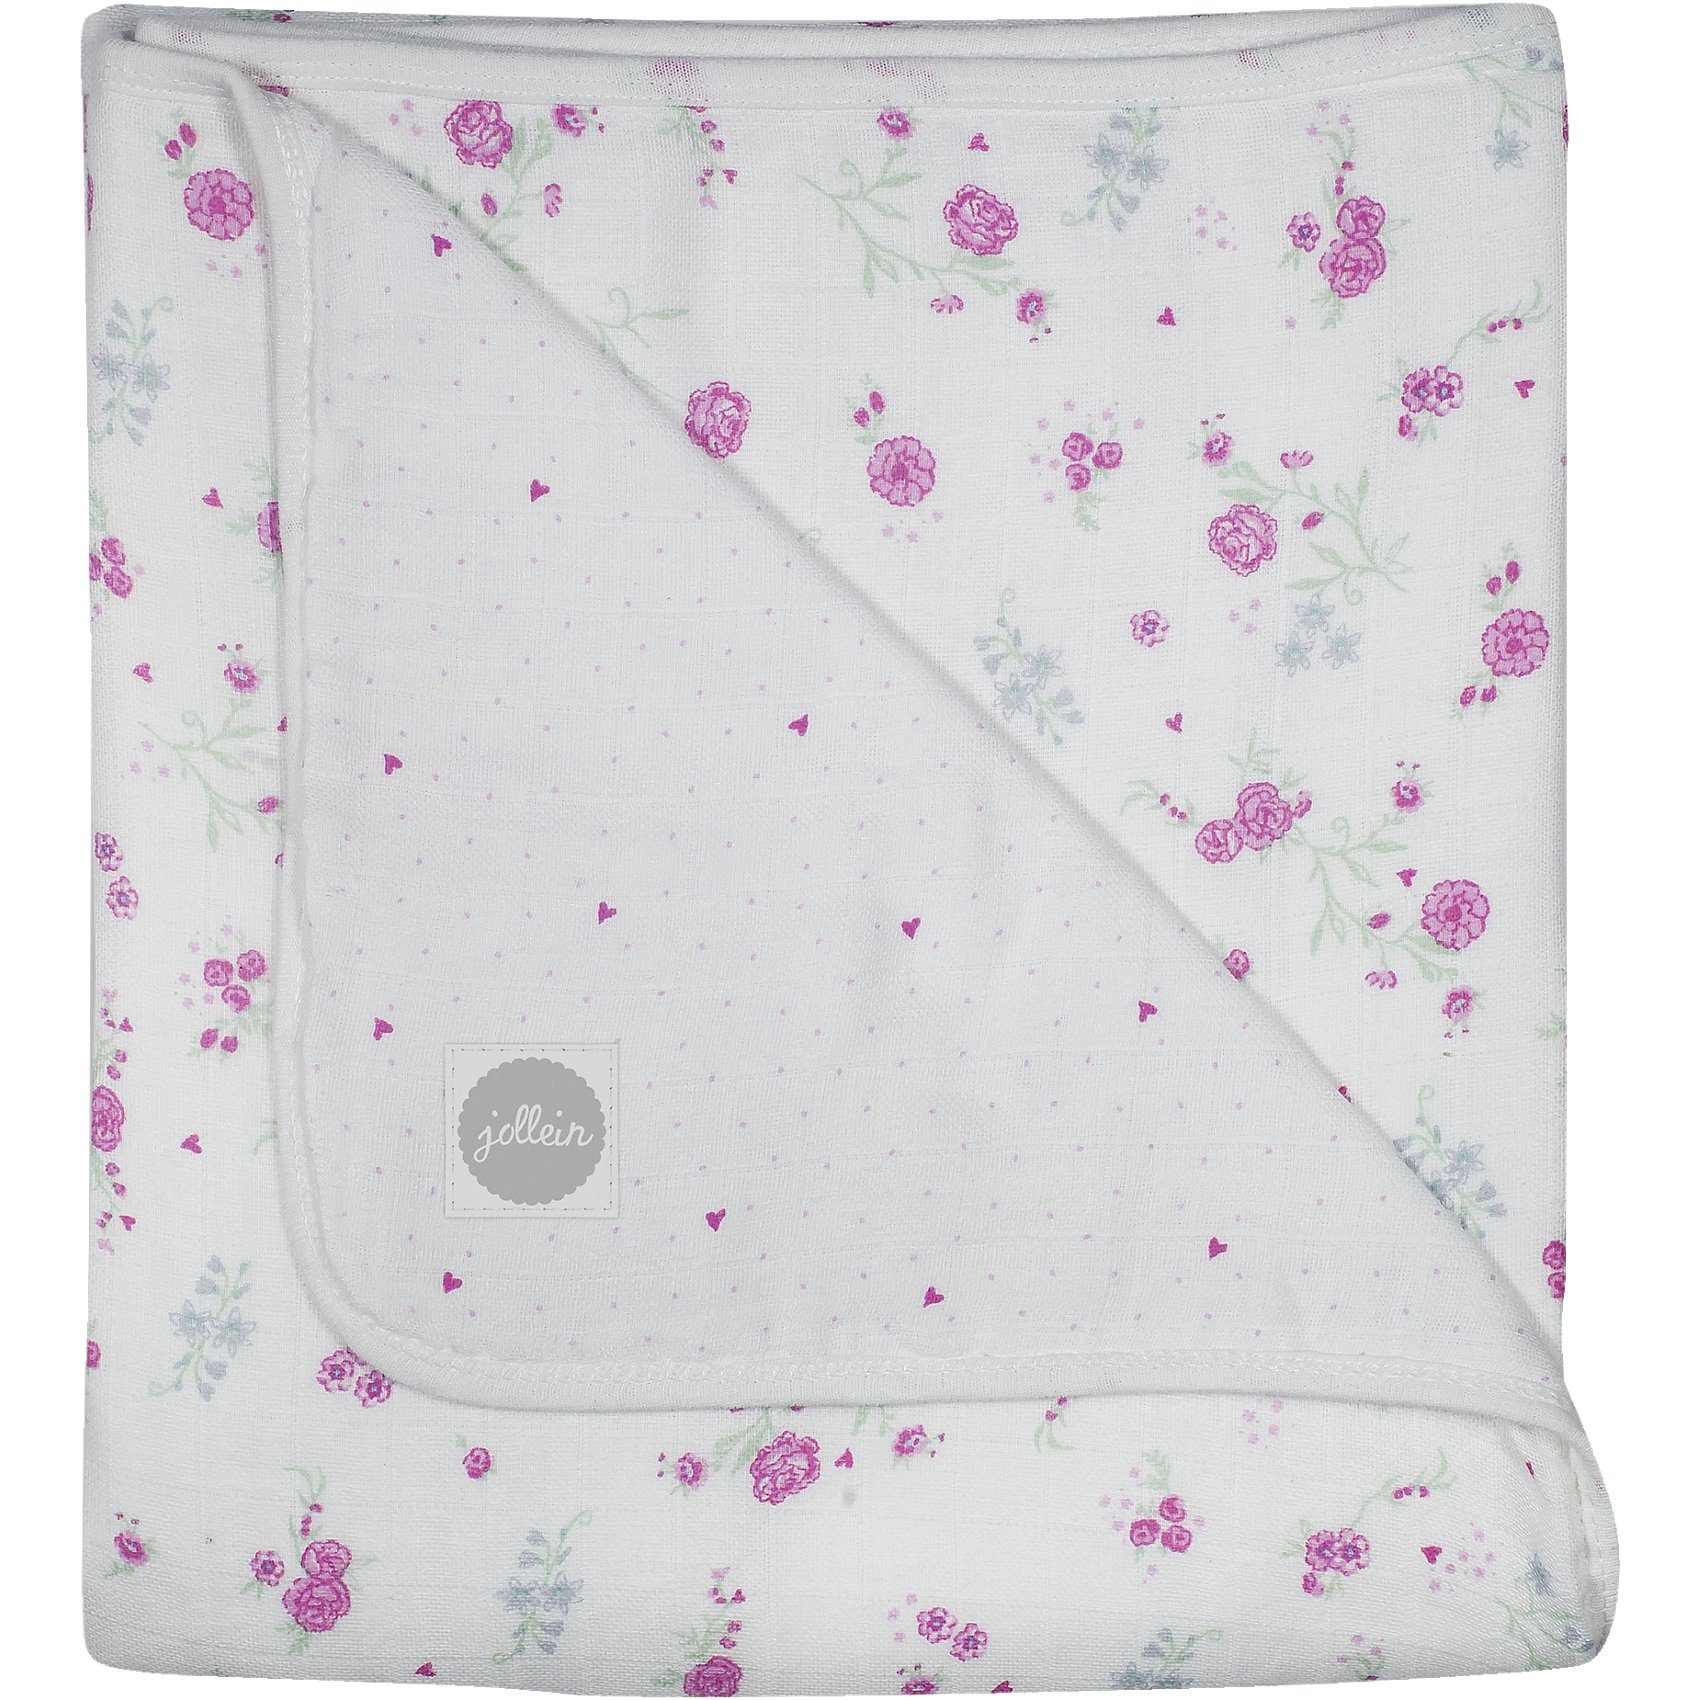 Jollein Mulldecke, Blooming, rosa, 75 x 100 cm